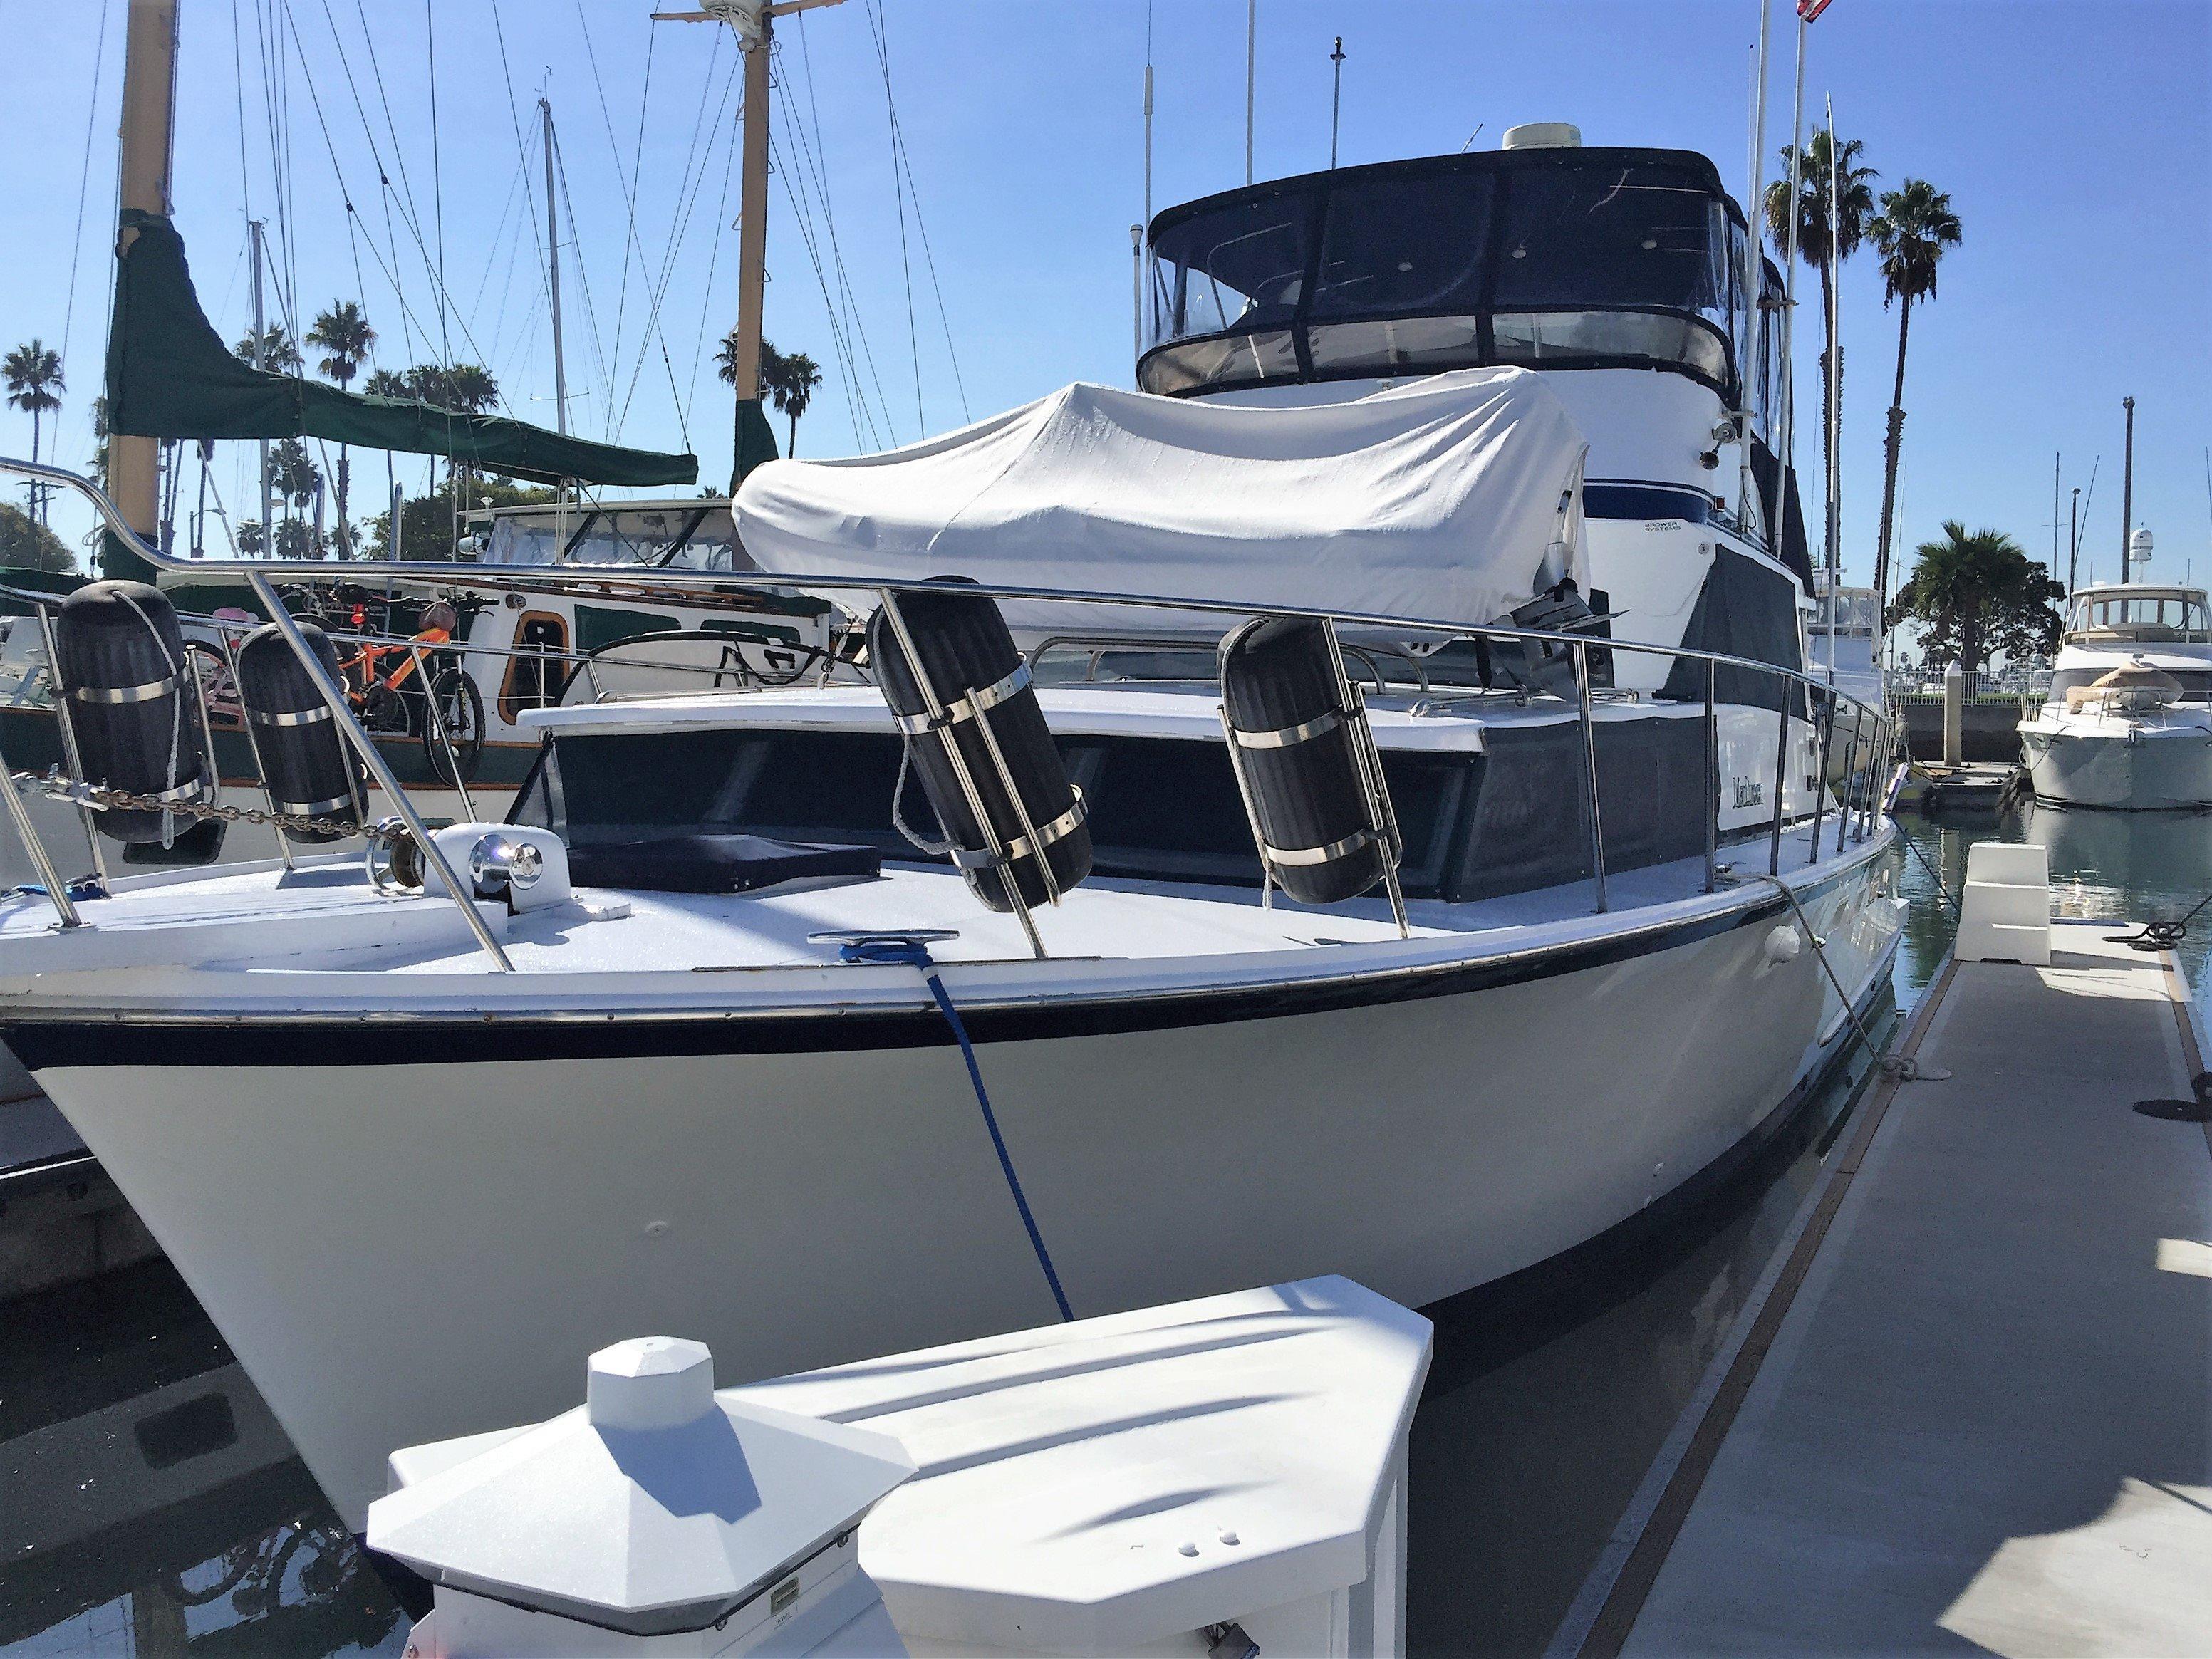 1969 Marlineer 48 Sport Fisher 6000010 Baja Boat Electrical Schematic Image